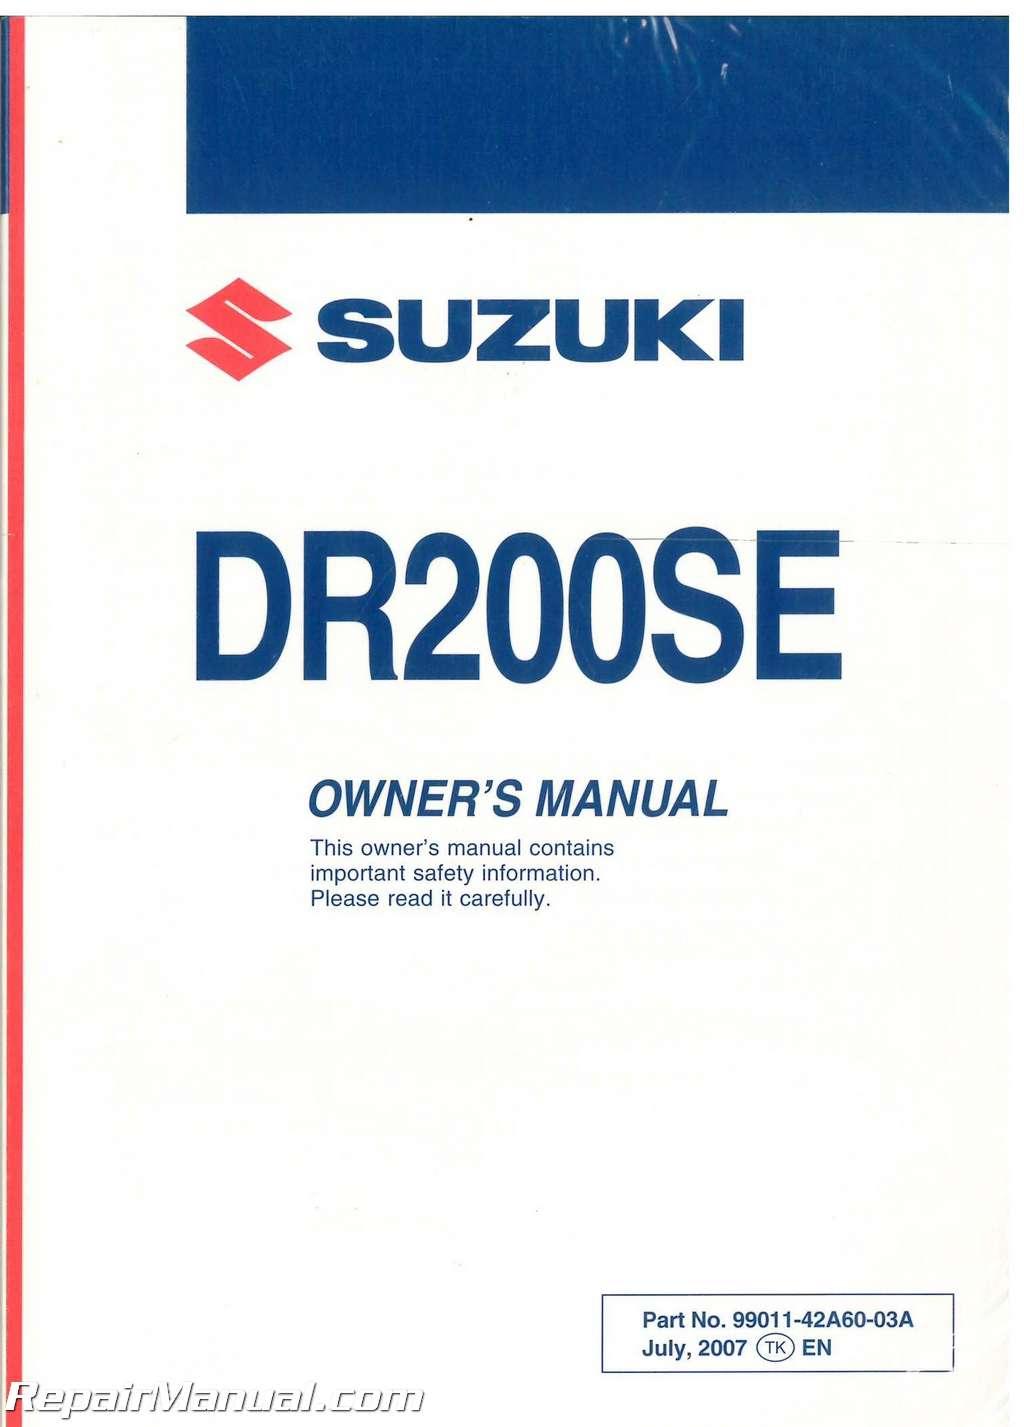 2008 suzuki dr200sek8 motorcycle owners manual suzuki dr 200 service manual pdf 2004 suzuki dr 200 service manual